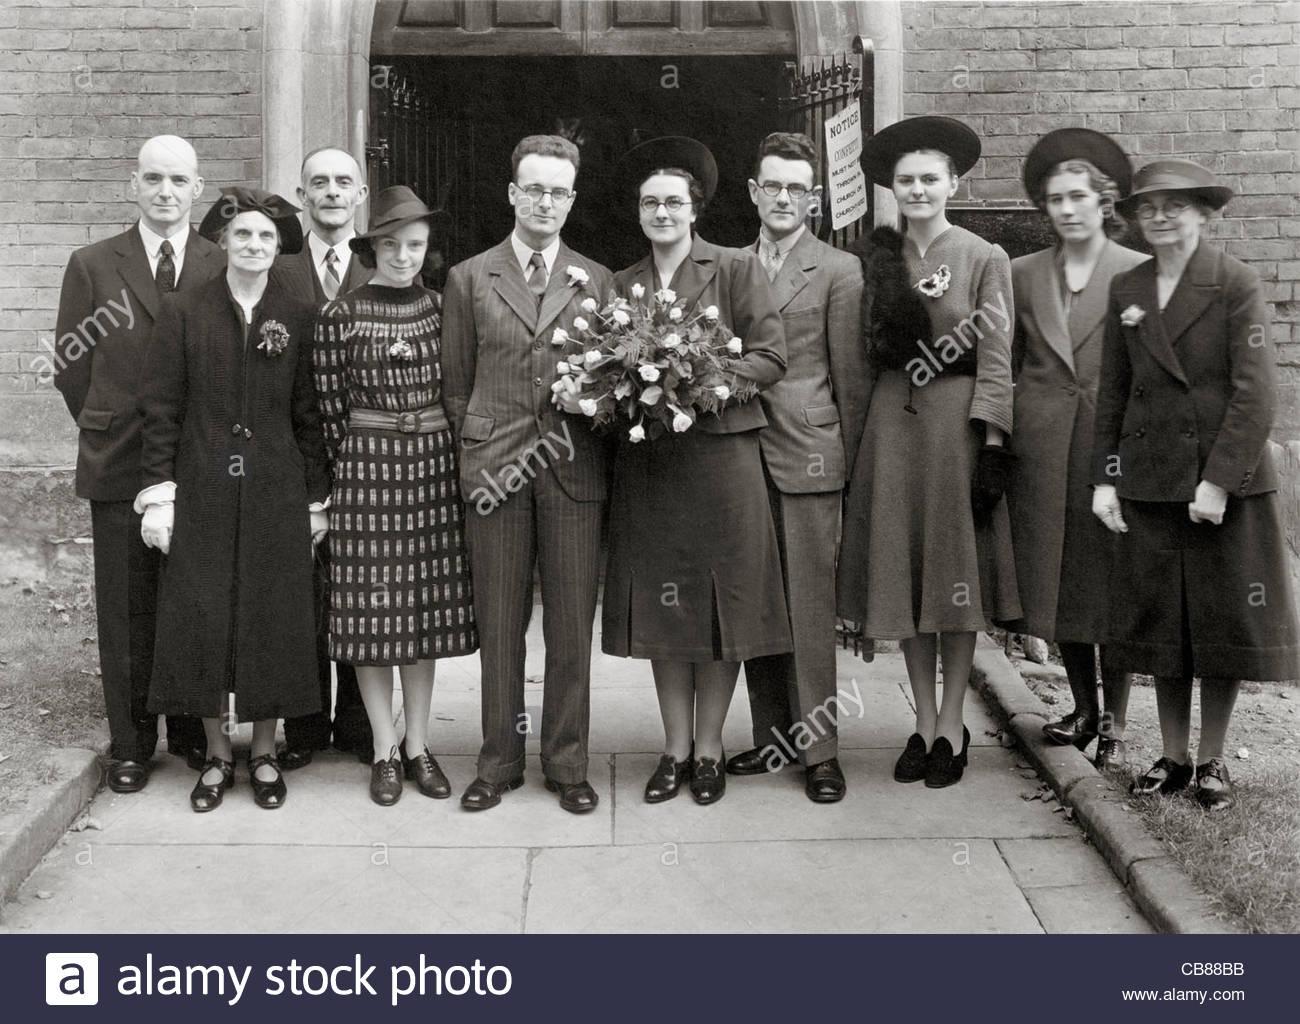 Grupo de fotos de boda de la familia delante de la apertura de la puerta de la Iglesia de Inglaterra 1940 Imagen De Stock